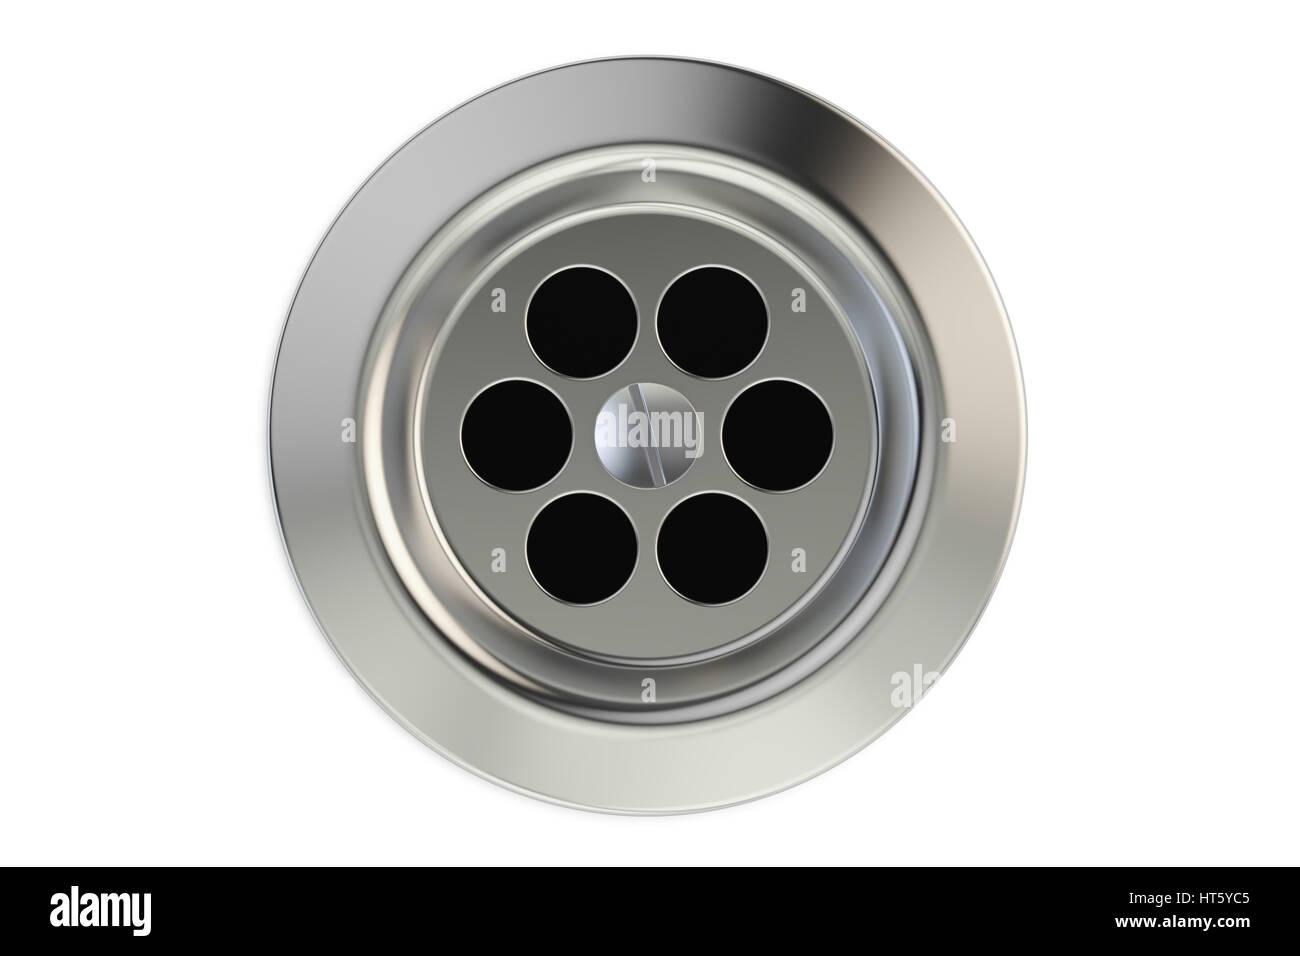 Top view of kitchen sink drain round plug hole 3d rendering stock top view of kitchen sink drain round plug hole 3d rendering workwithnaturefo